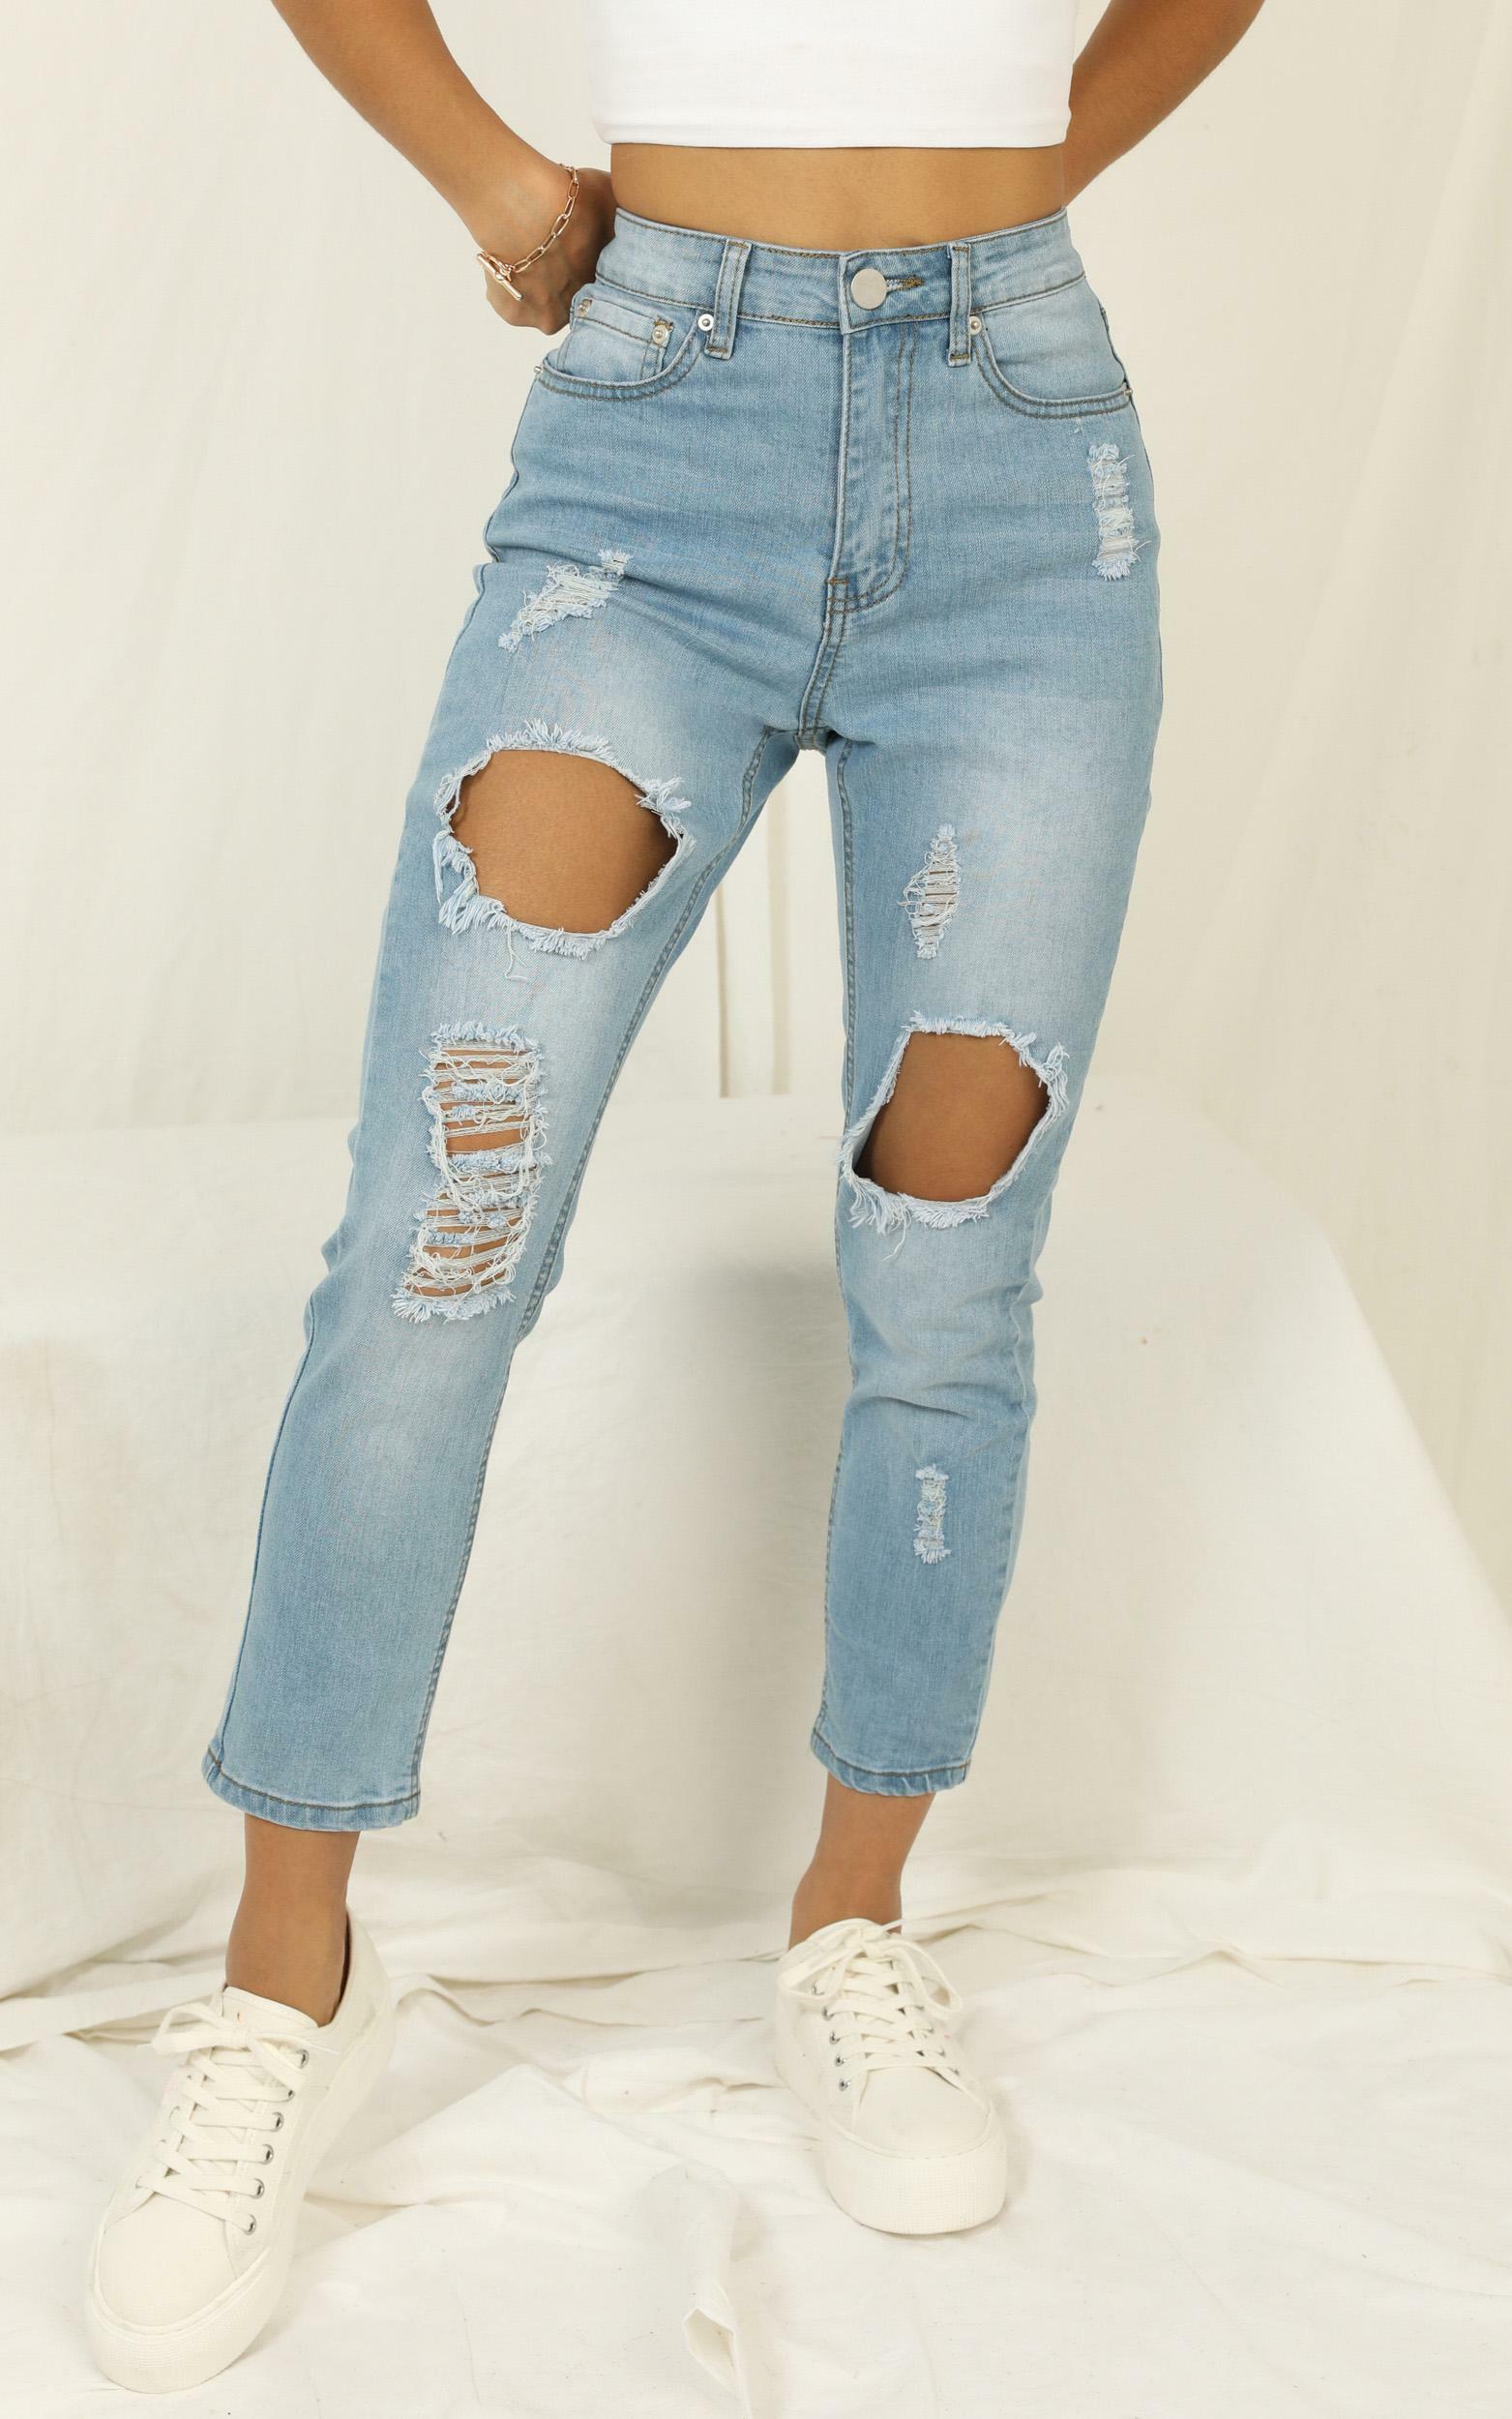 Georgia Jeans In Mid Wash Denim - 12 (L), Blue, hi-res image number null